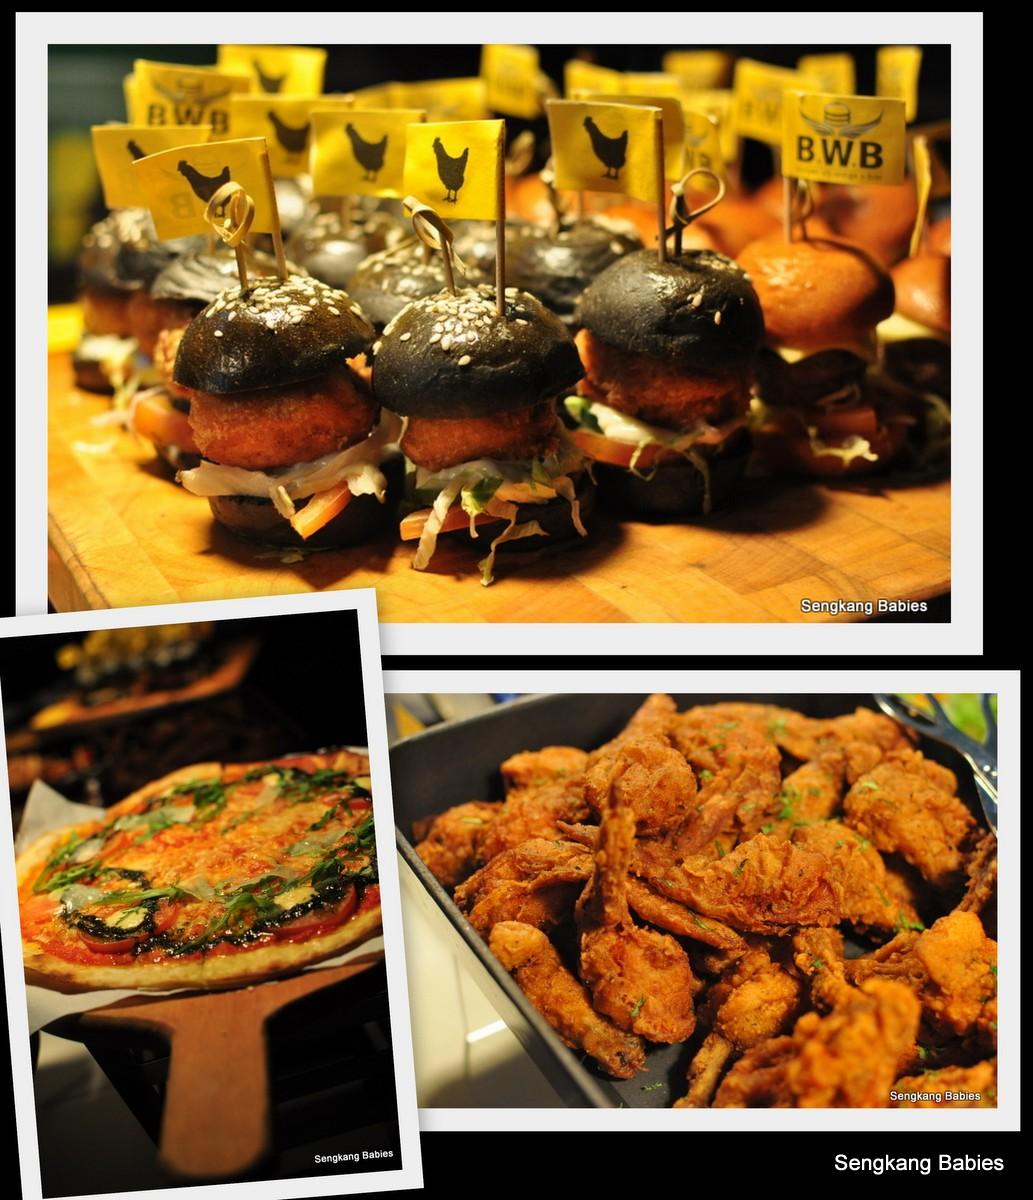 BWB Burger Wings Bar